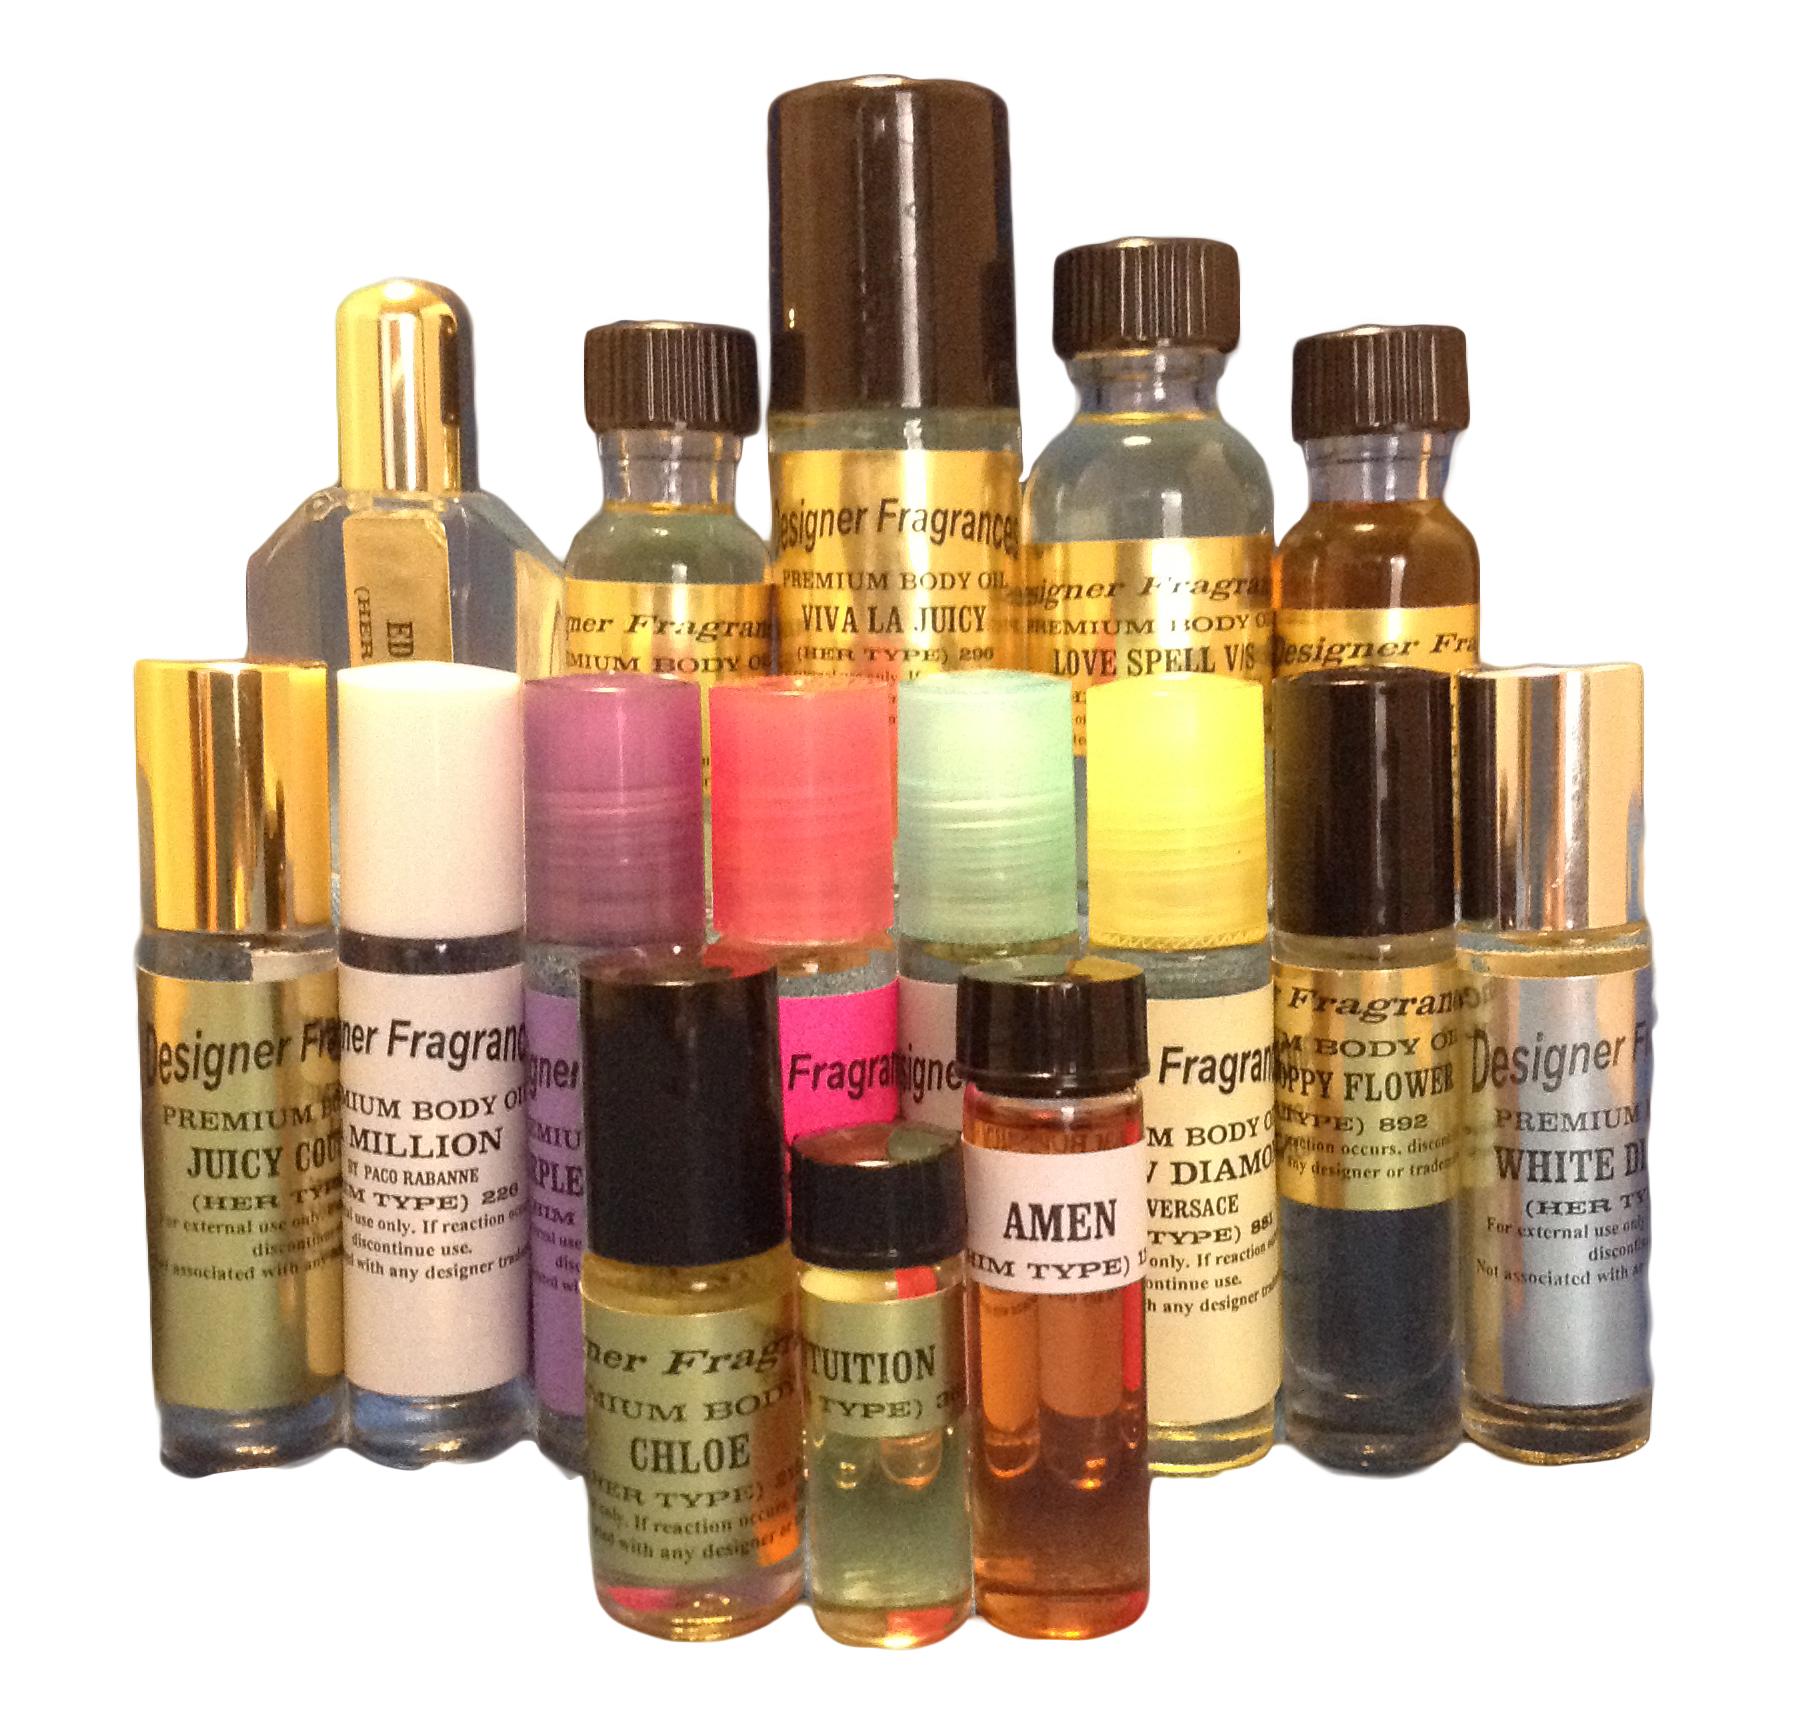 Body oils wholesale fragrance oils perfume oils scented oils body oils perfume oils pre filled mightylinksfo